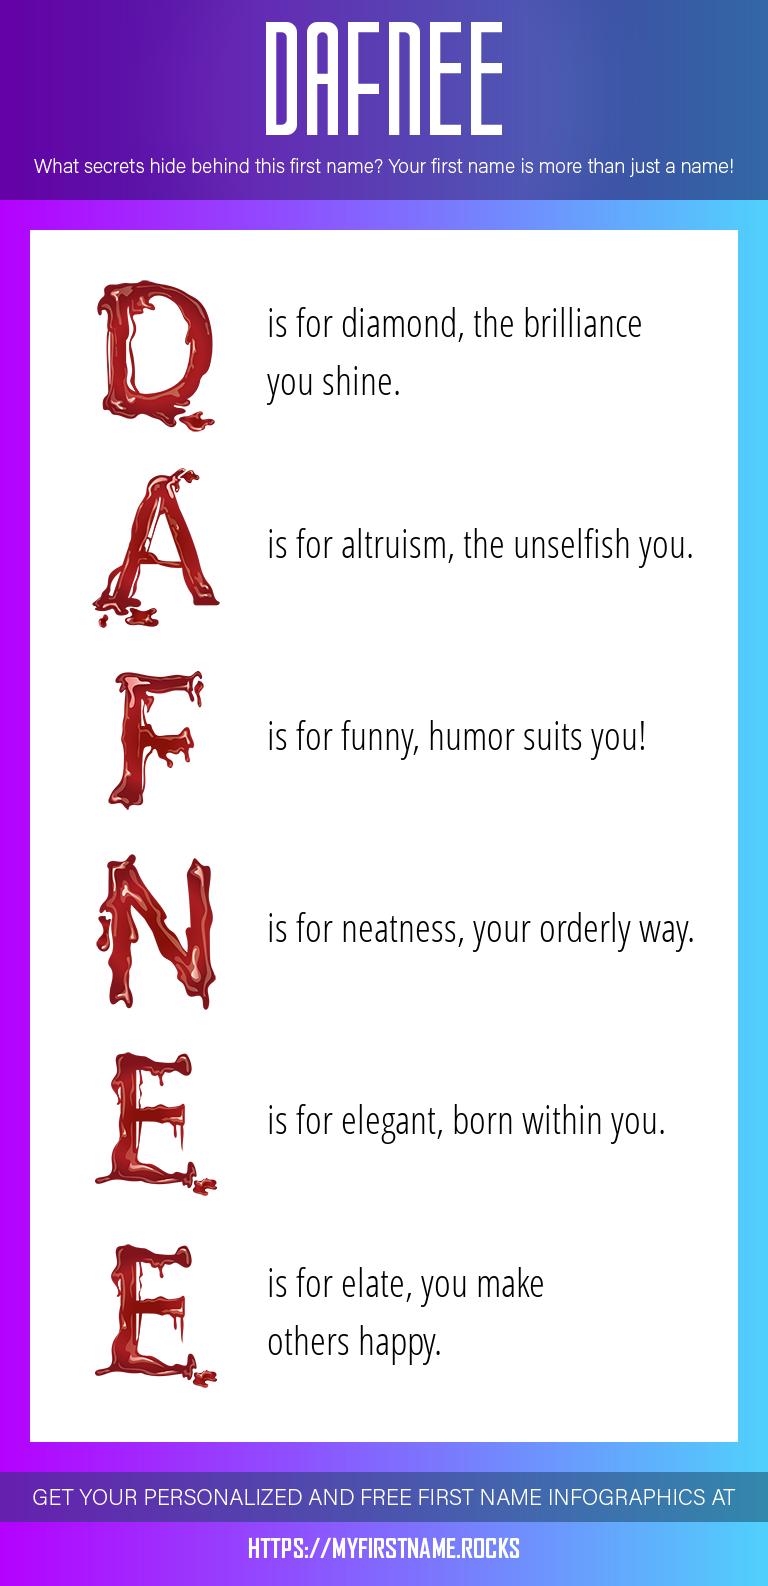 Dafnee Infographics